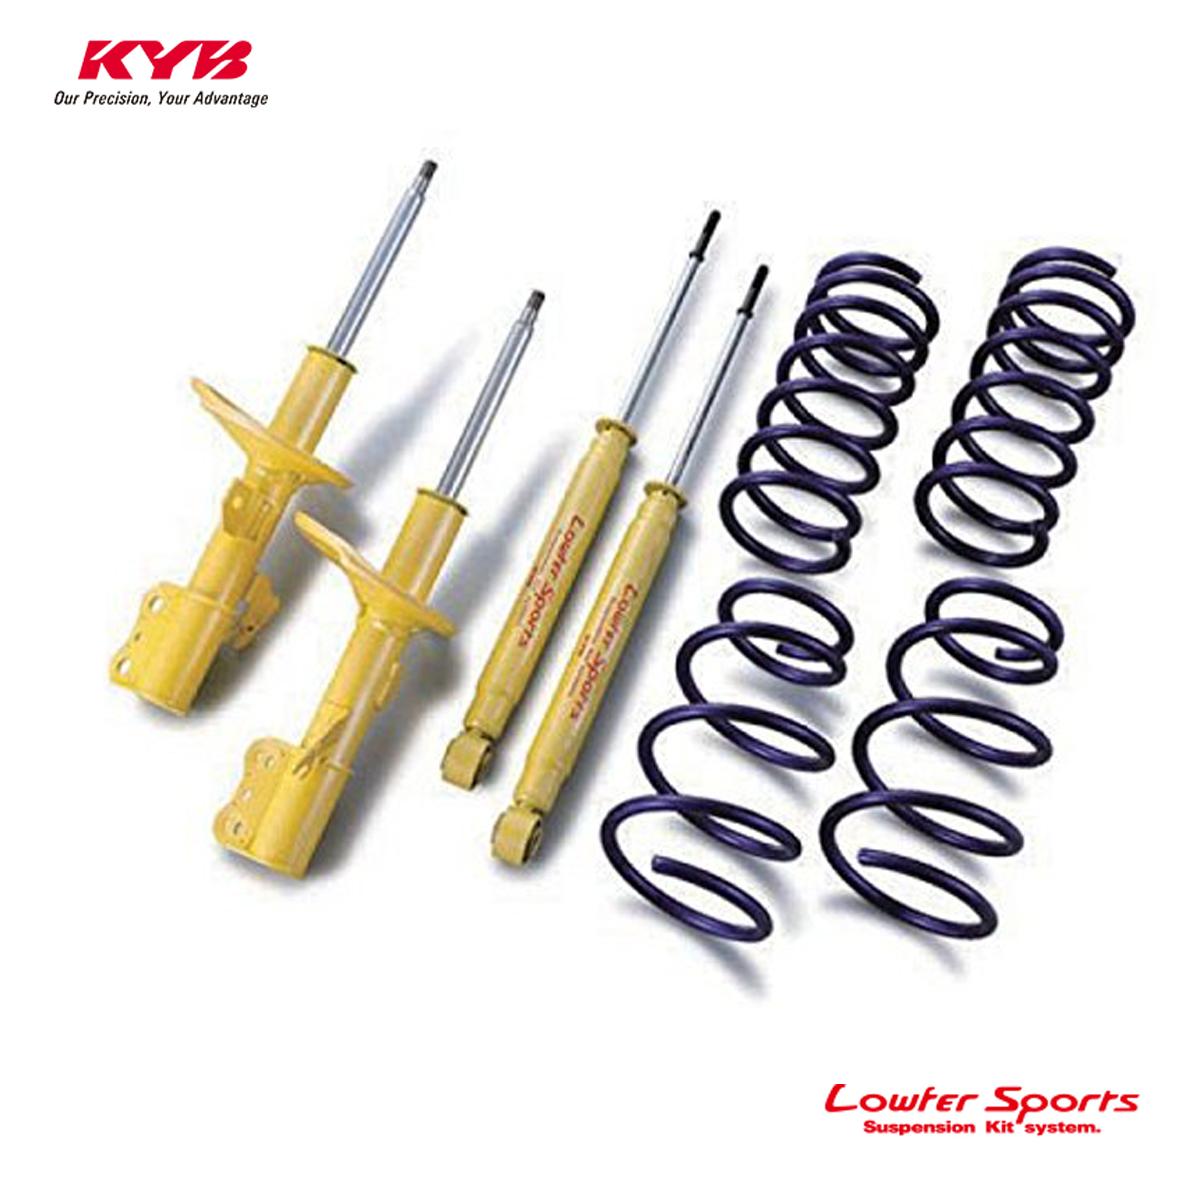 KYB カヤバ セレナ C25 ショックアブソーバー サスペンションキット Lowfer Sports LKIT-C25 配送先条件有り